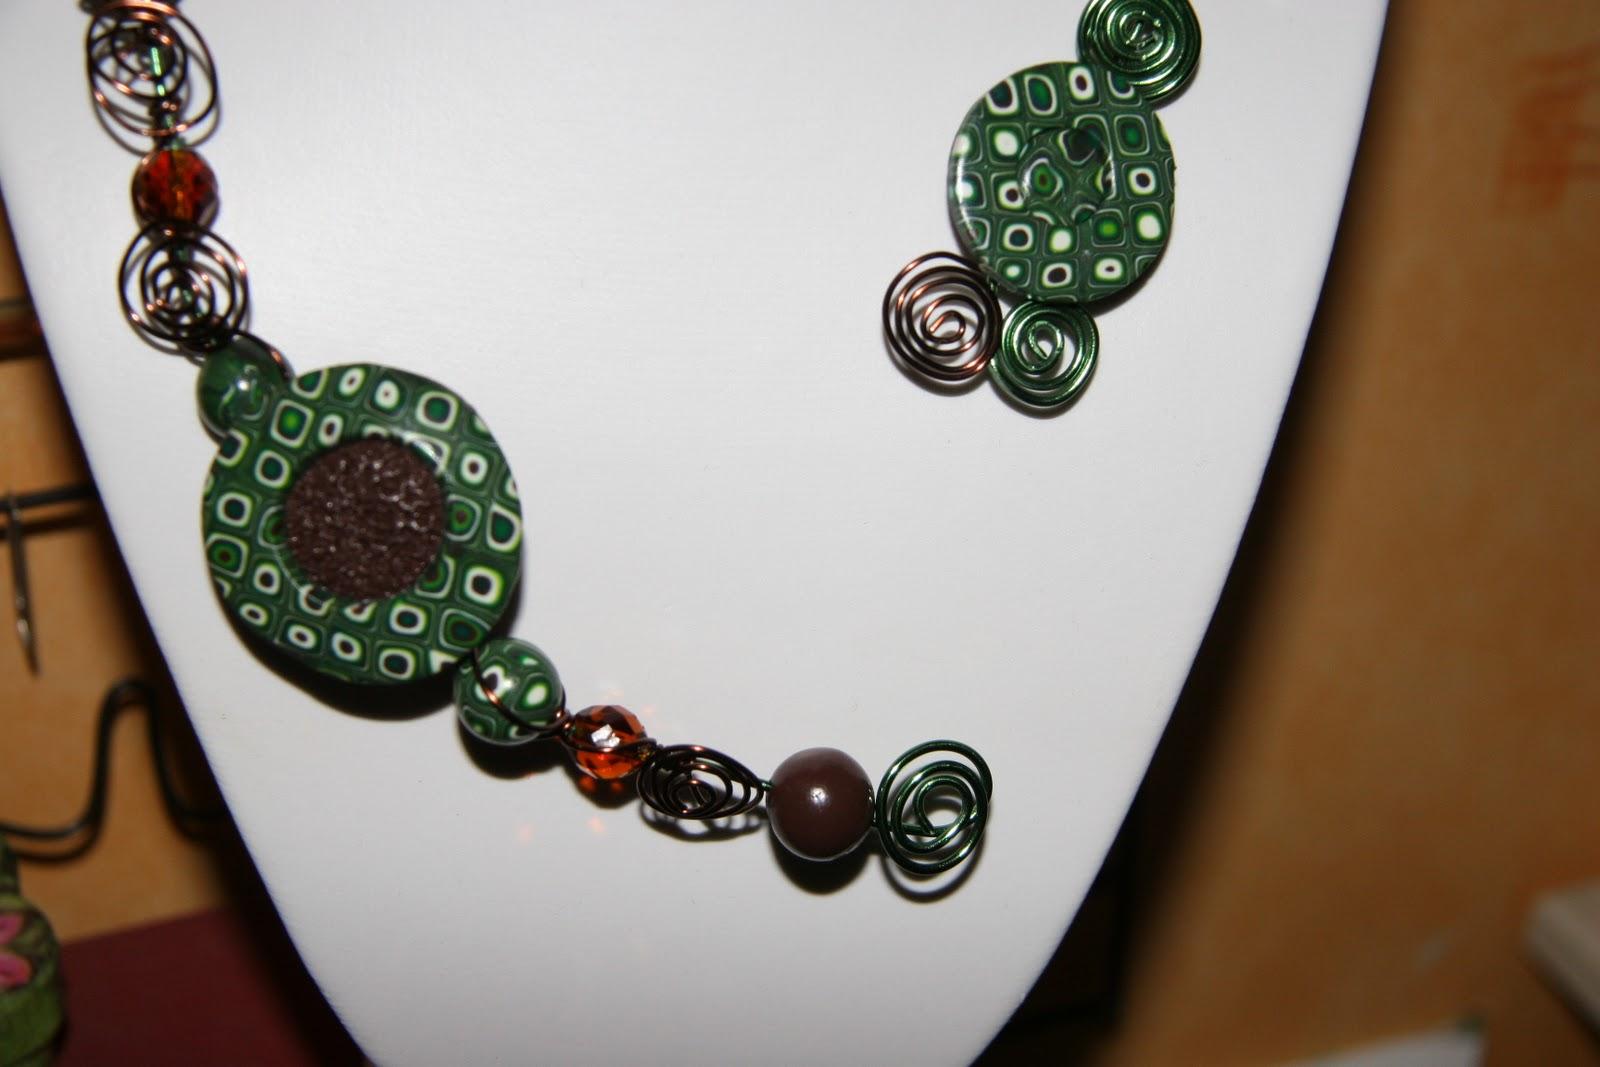 perles d 39 arc en ciel collier zigzag avec perles en fimo sur fil alu. Black Bedroom Furniture Sets. Home Design Ideas